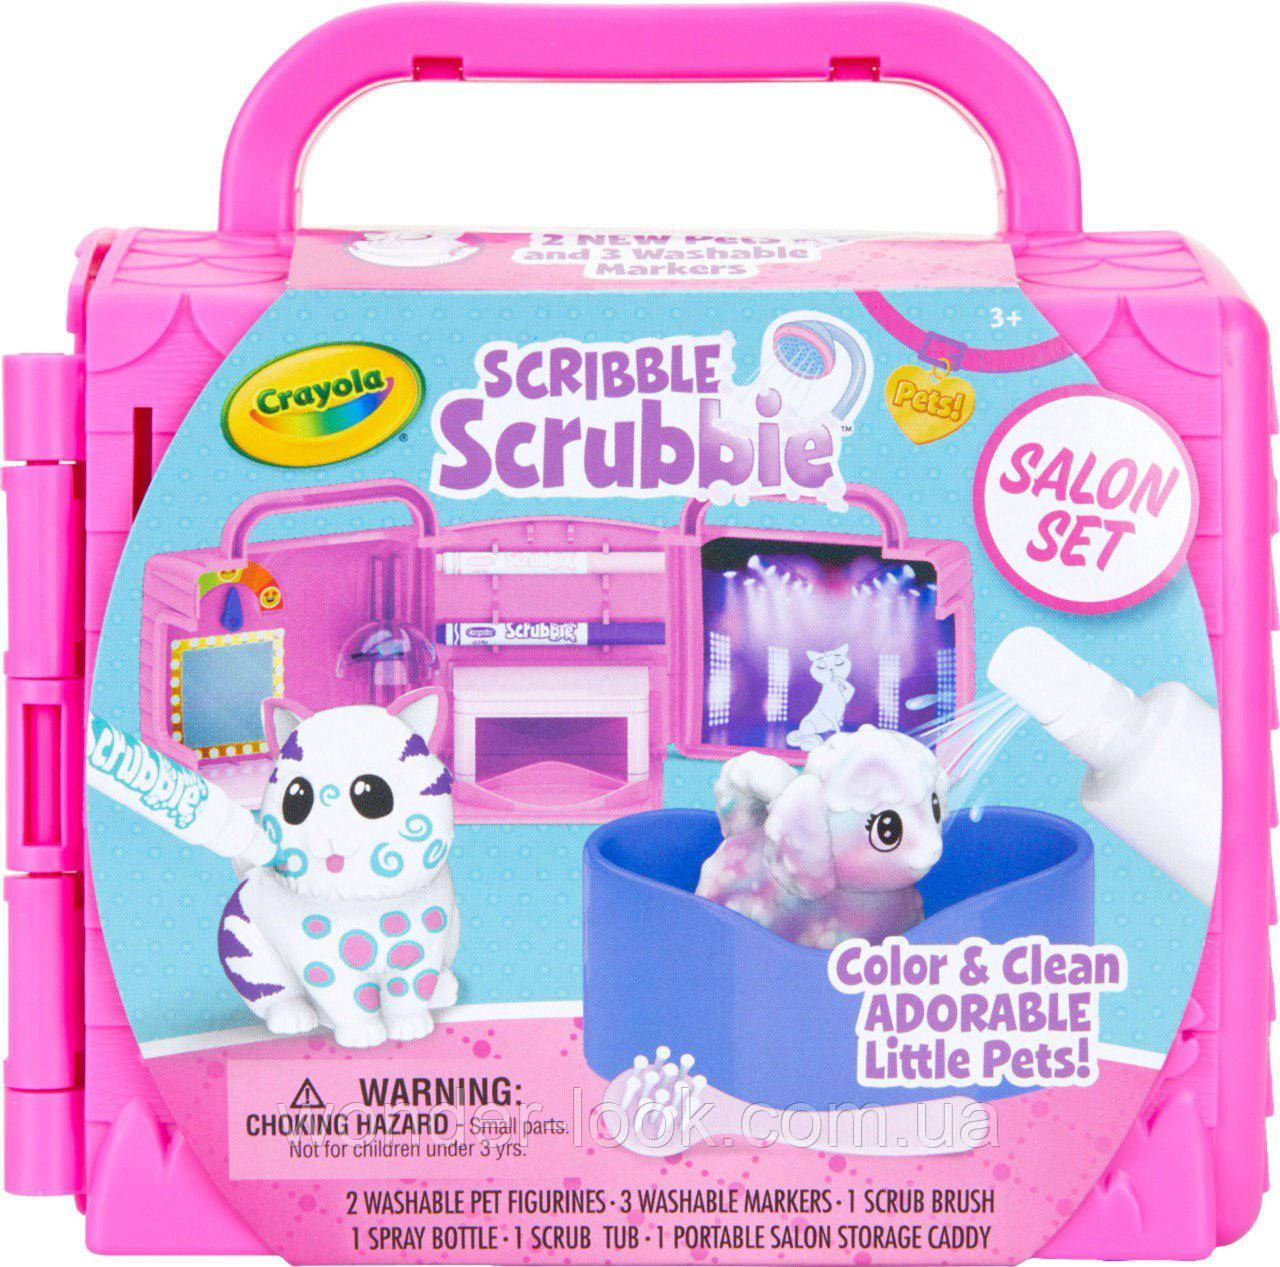 Crayola раскрашиваемые питомцы  Scribble Scrubbie Toy Pet Playset